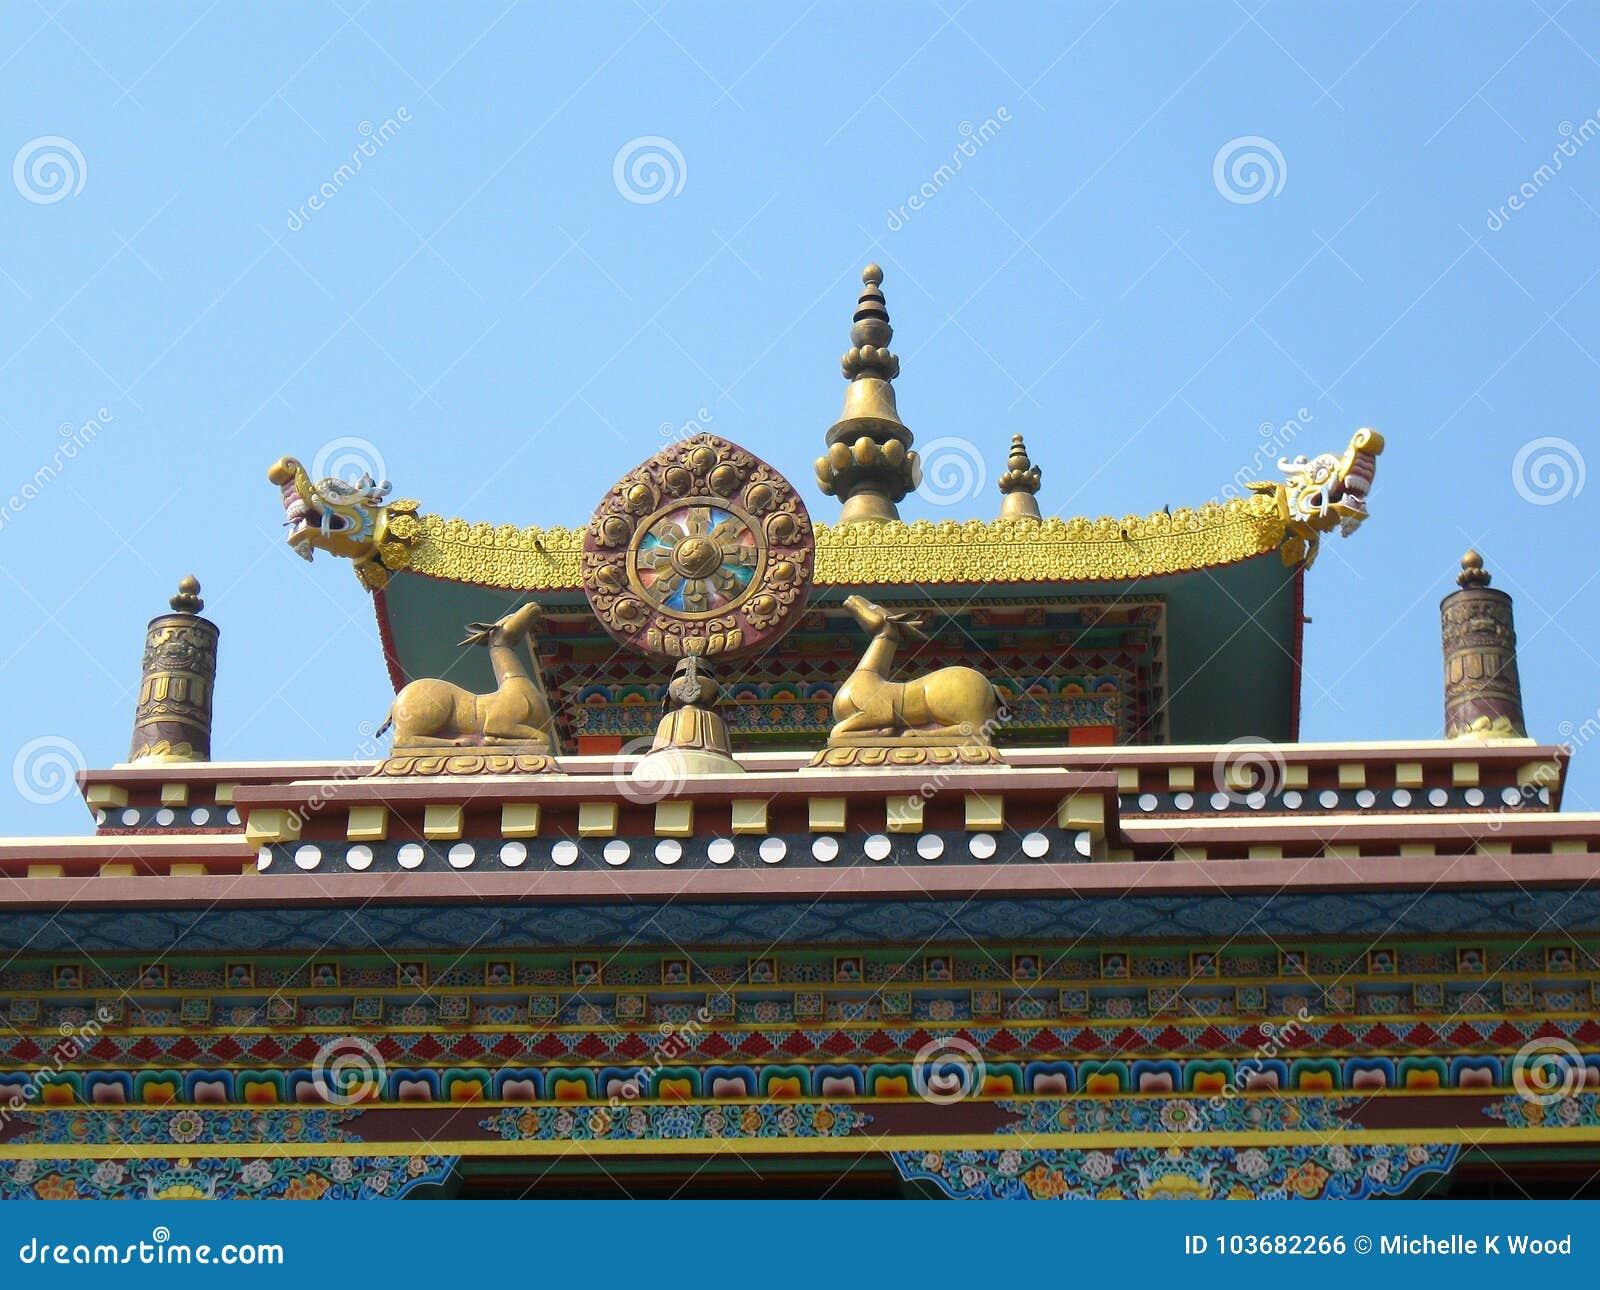 Karma Tharjay Chokhorling Tibetan Monastery Bodh Gaya India